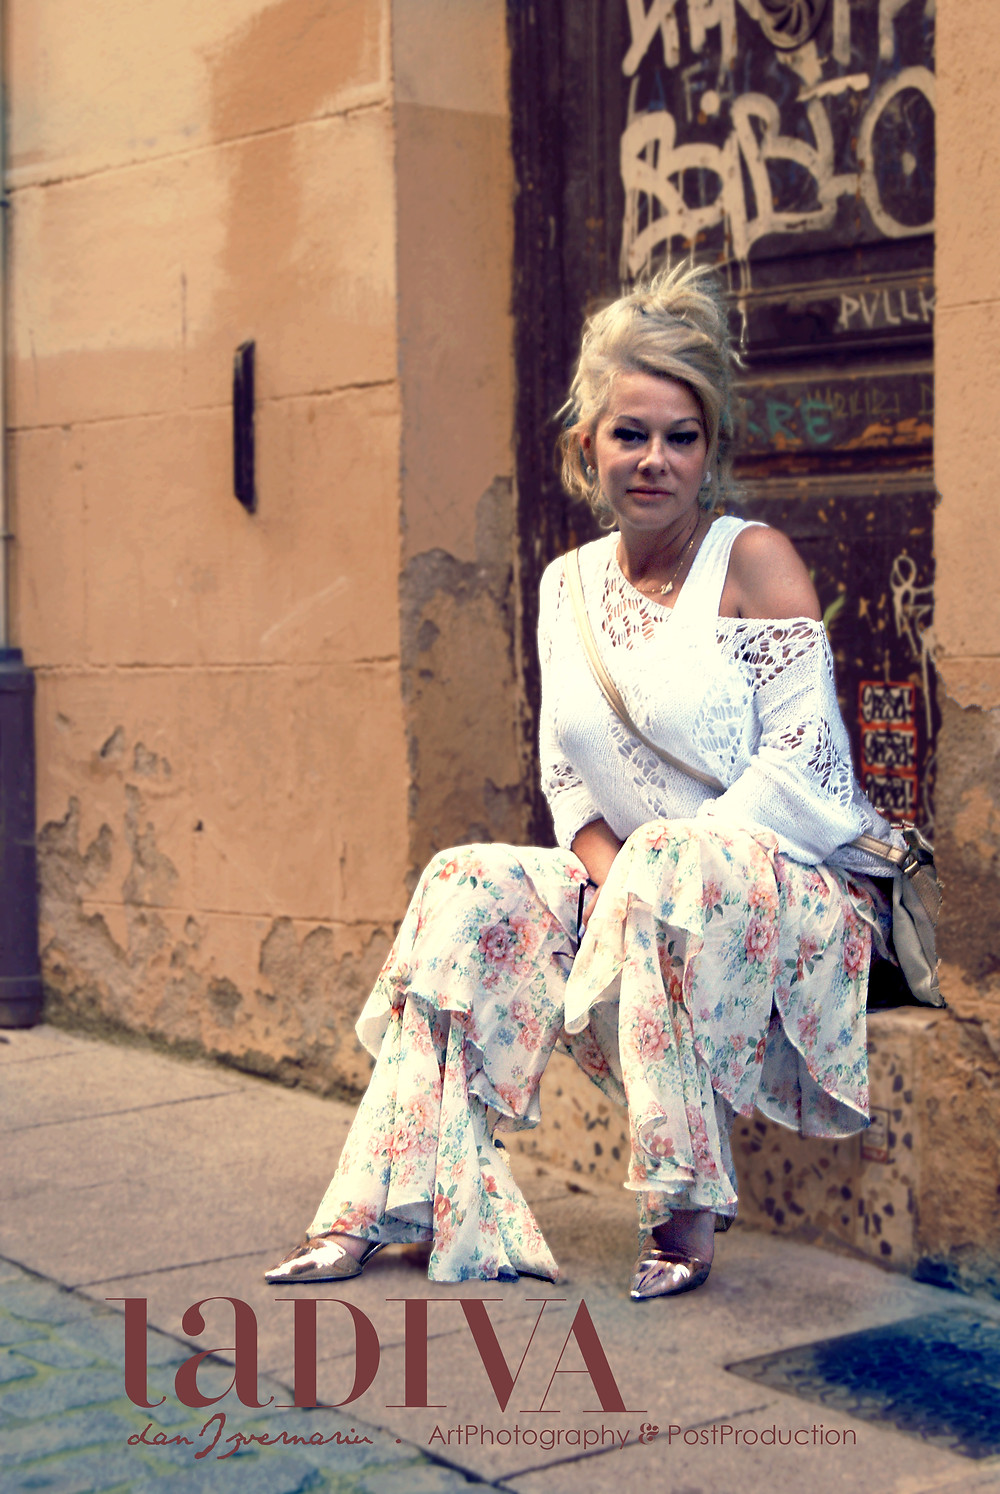 Modelling : Madalina Manta, Segovia 2018 Photo & PostProduction by danIzvernariu . , Madrid España